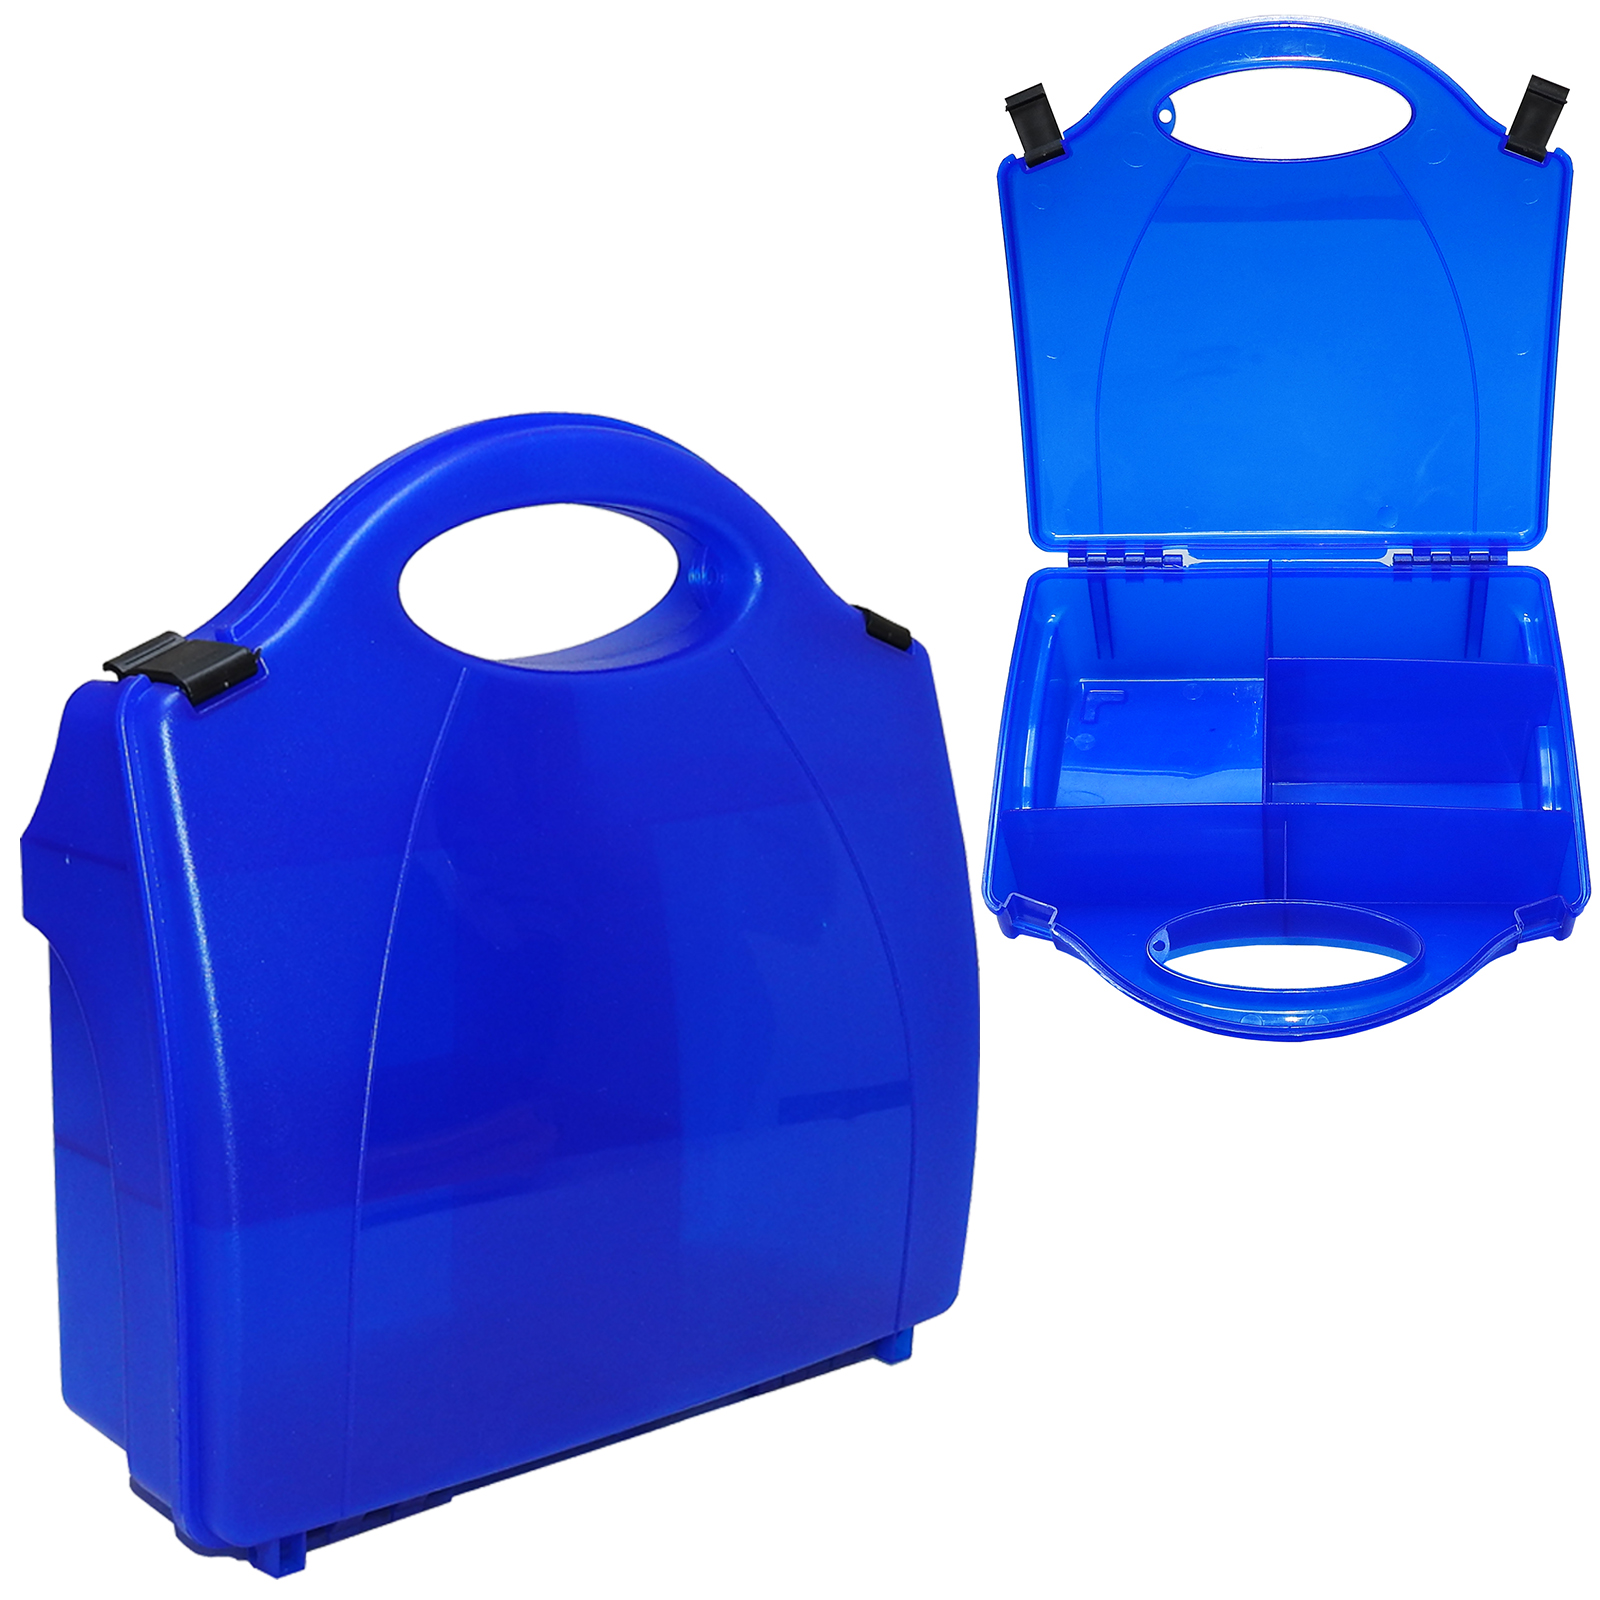 Details about Steroplast Premium Blue Premier Empty Build Your Own First  Aid Kit Storage Box